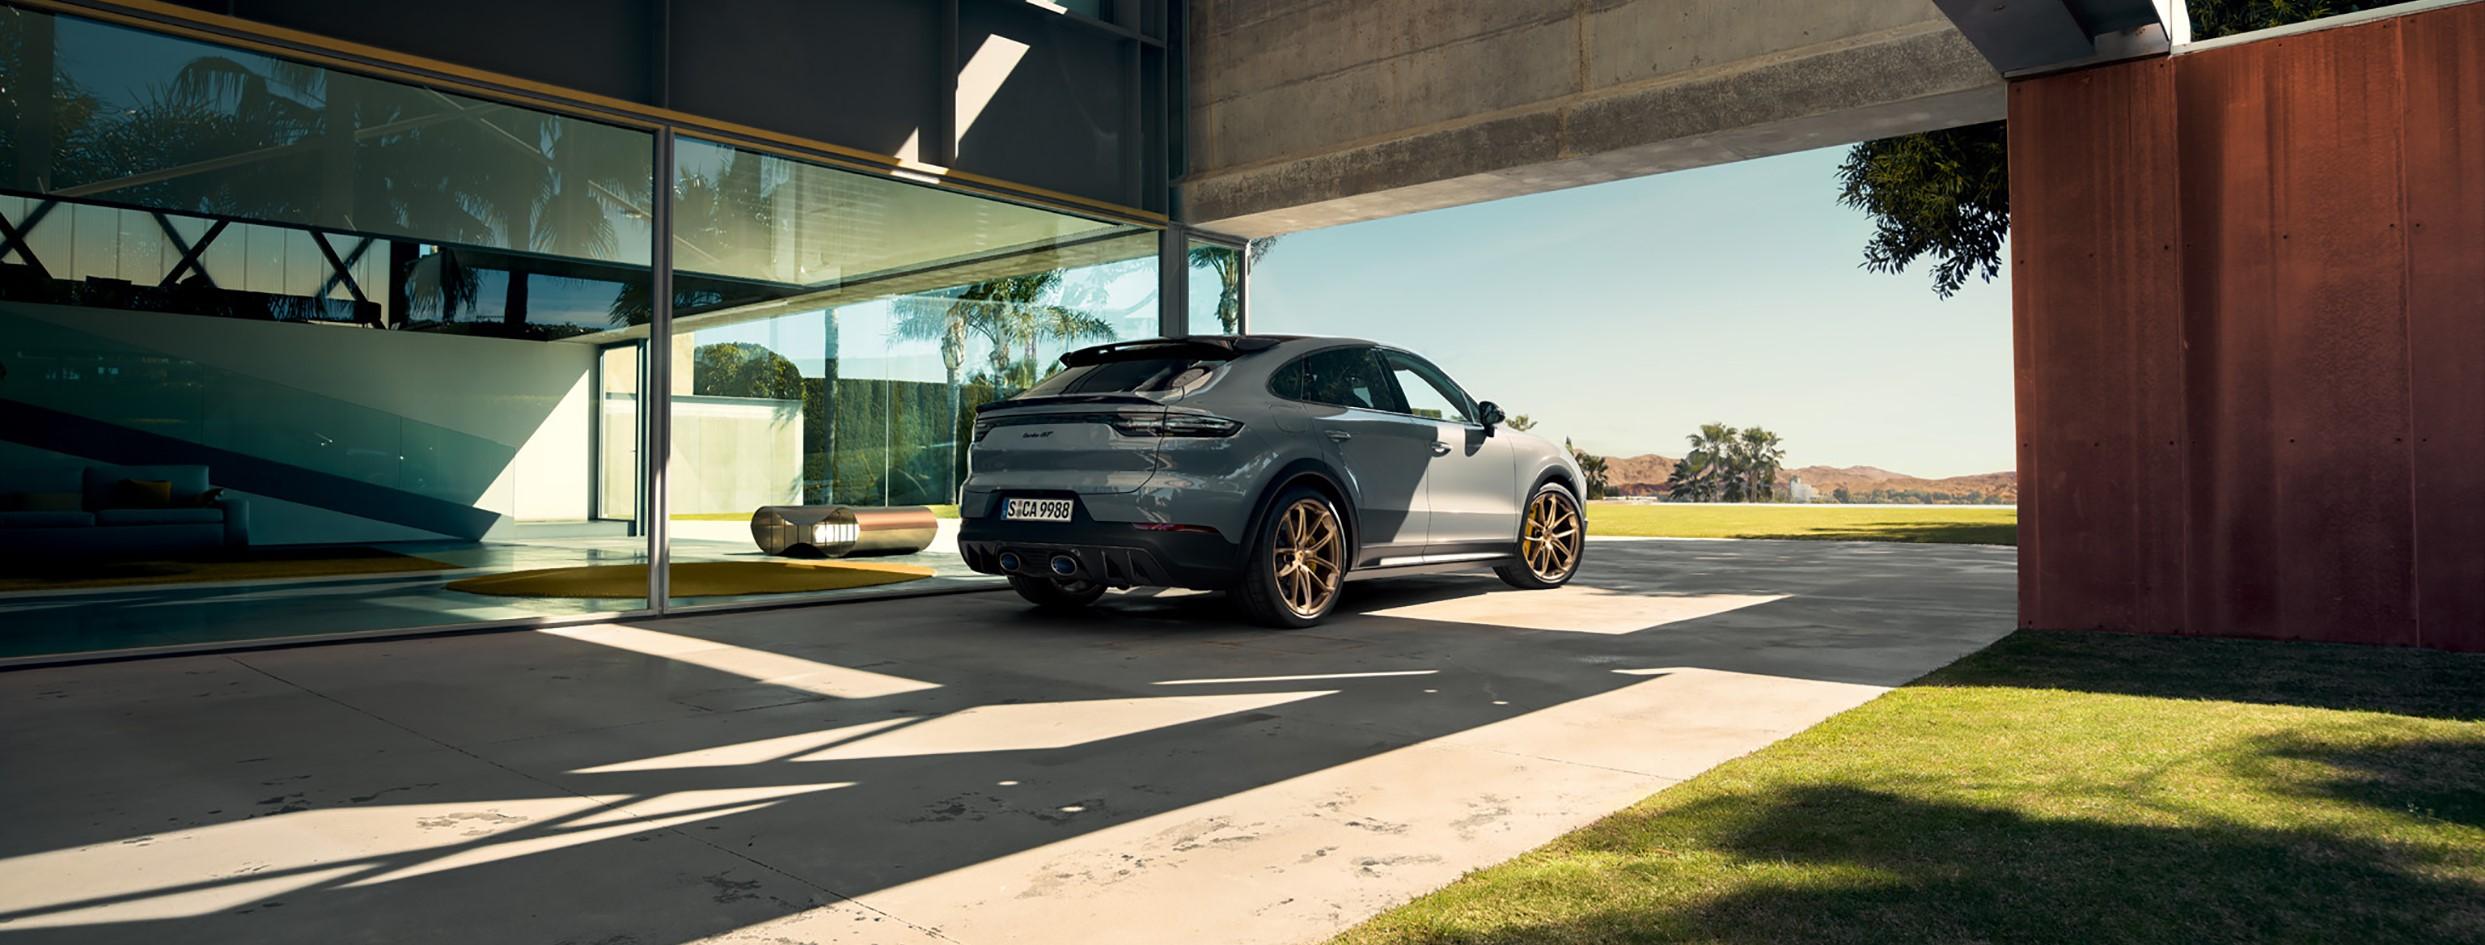 La nuova Cayenne Turbo GT.